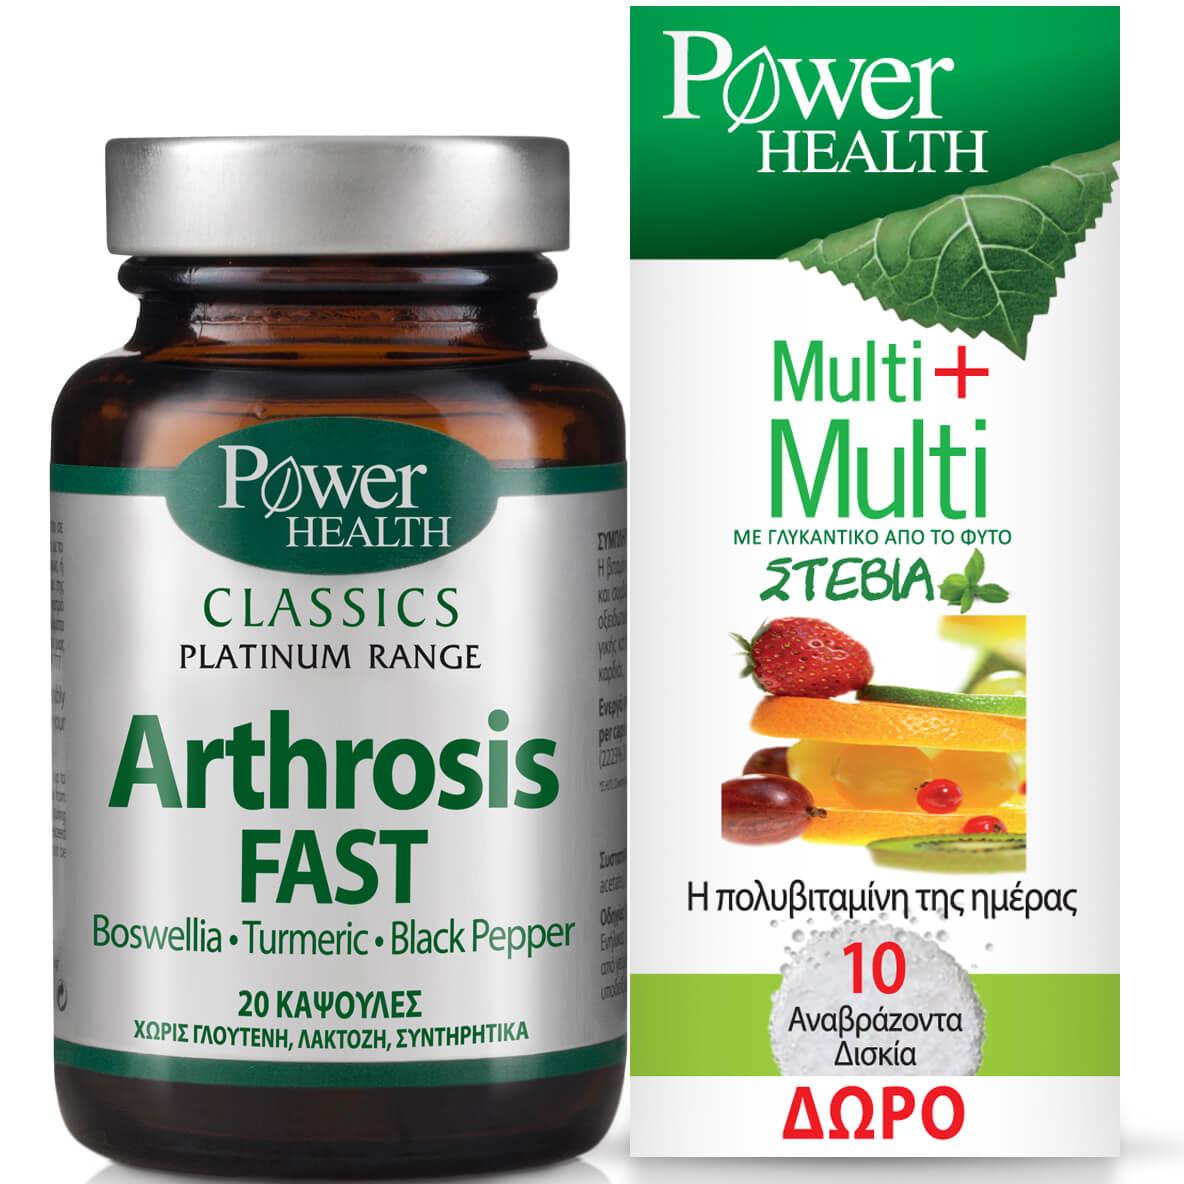 Power Health Πακέτο Προσφοράς Platinum Arthrosis Fast 20Caps & Δώρο Multi + Multi με Stevia 10Effer.Tabs